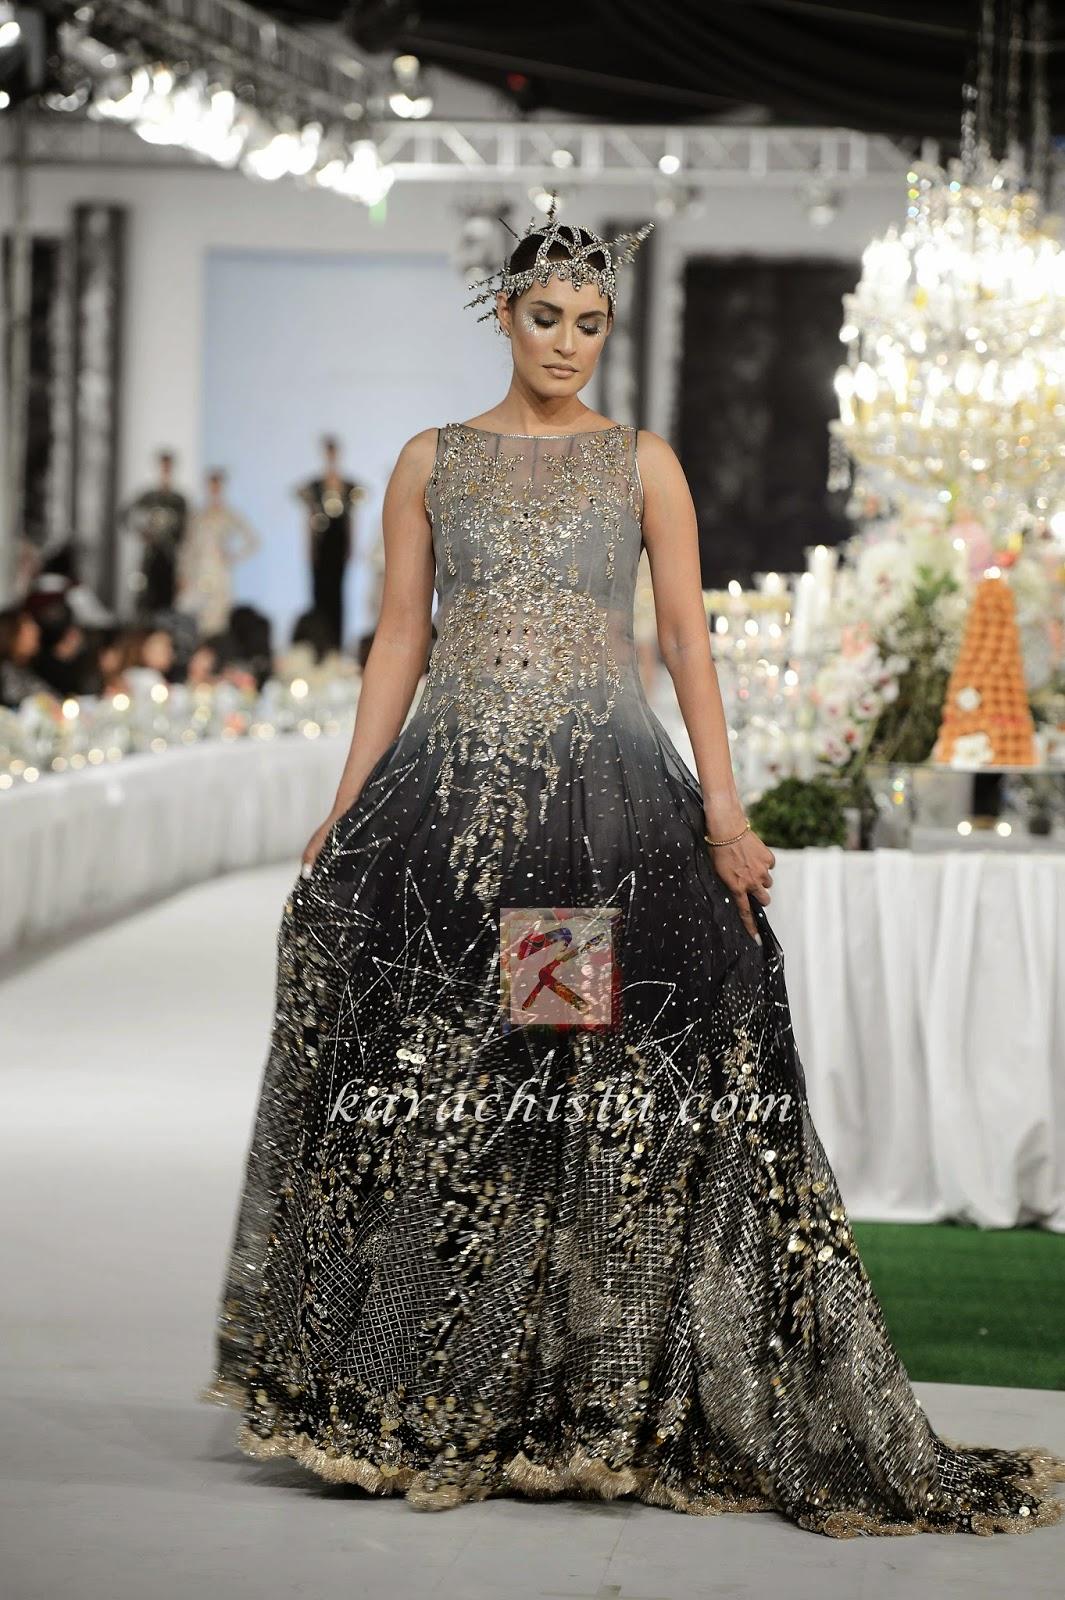 Nadia Hussain in KARMA Swarovski crystals ensemble